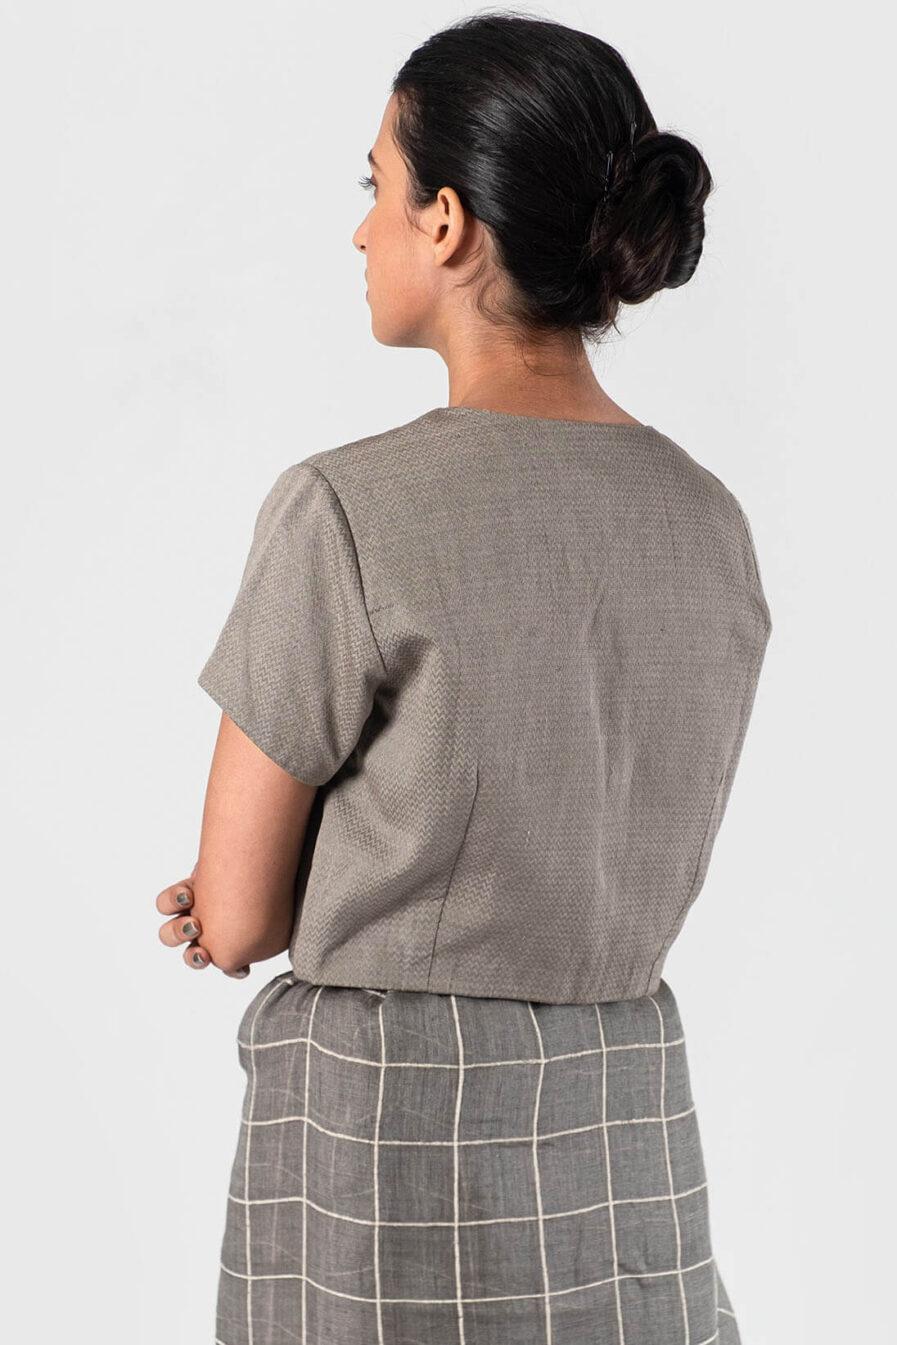 Anavila Grey Herringbone blouse